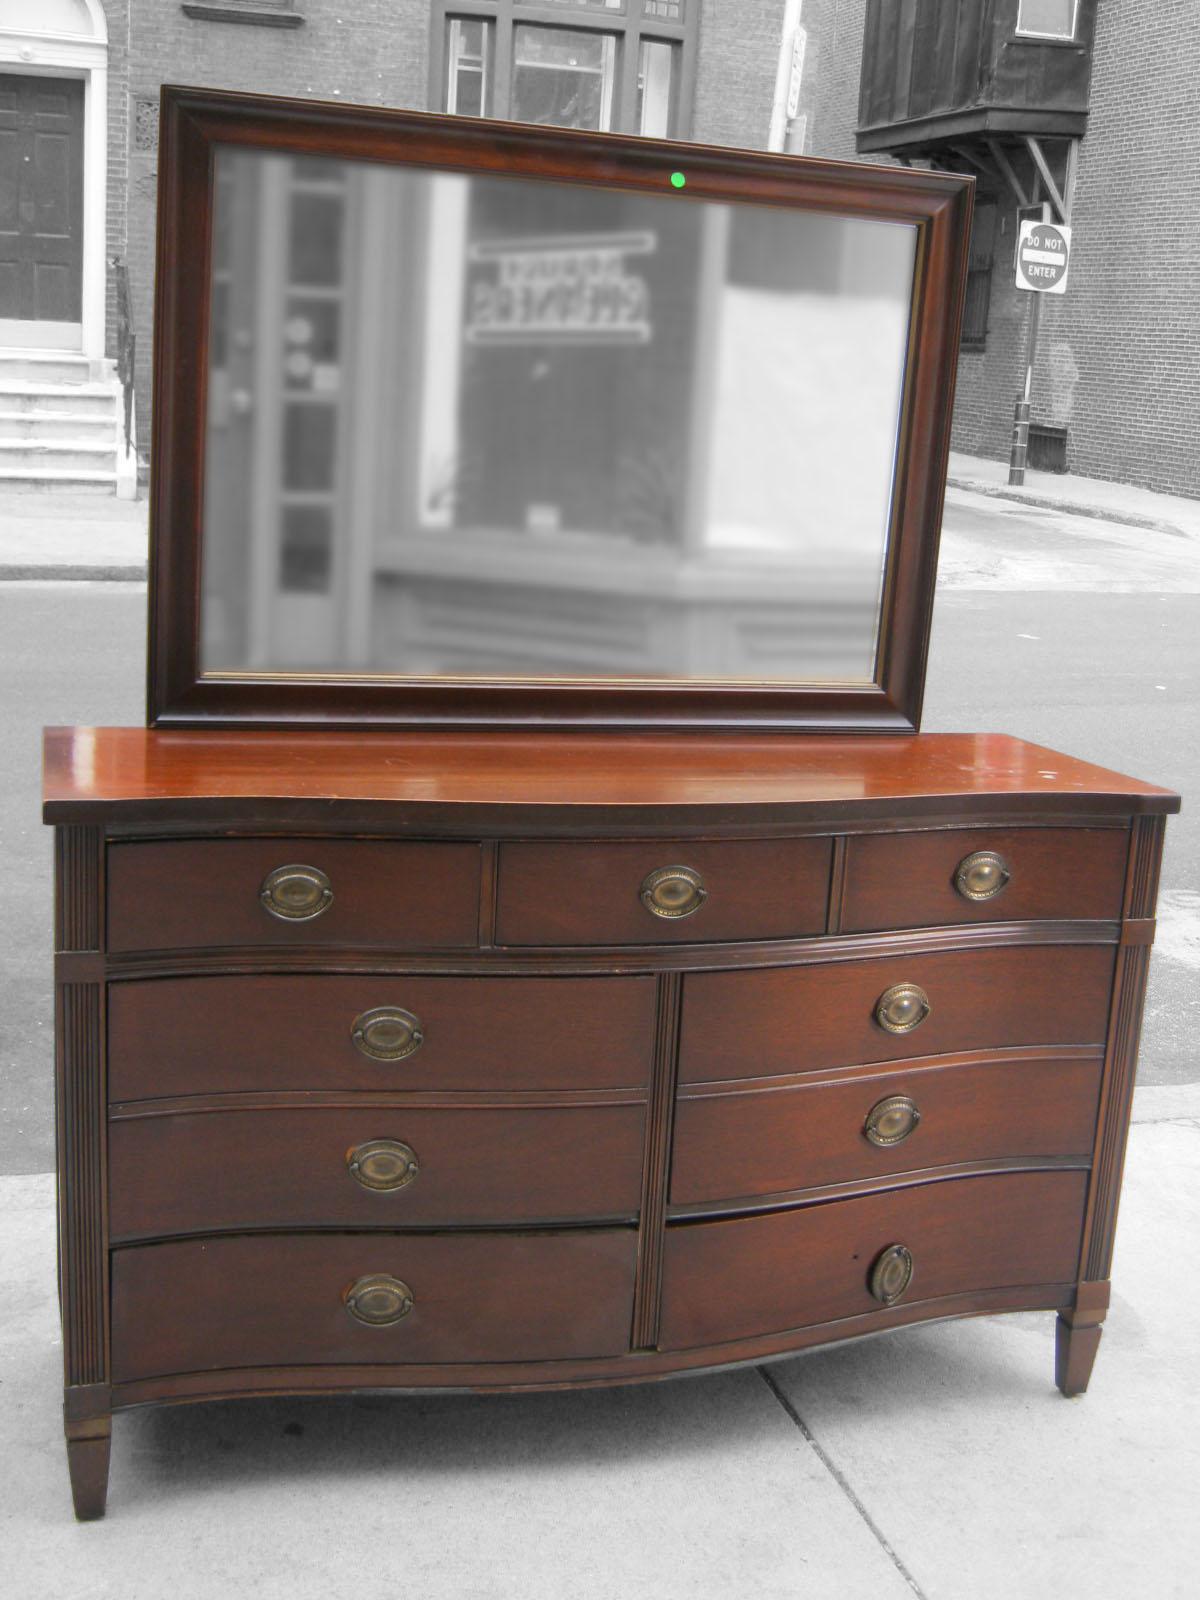 Uhuru Furniture Amp Collectibles Mahogany Bureau With